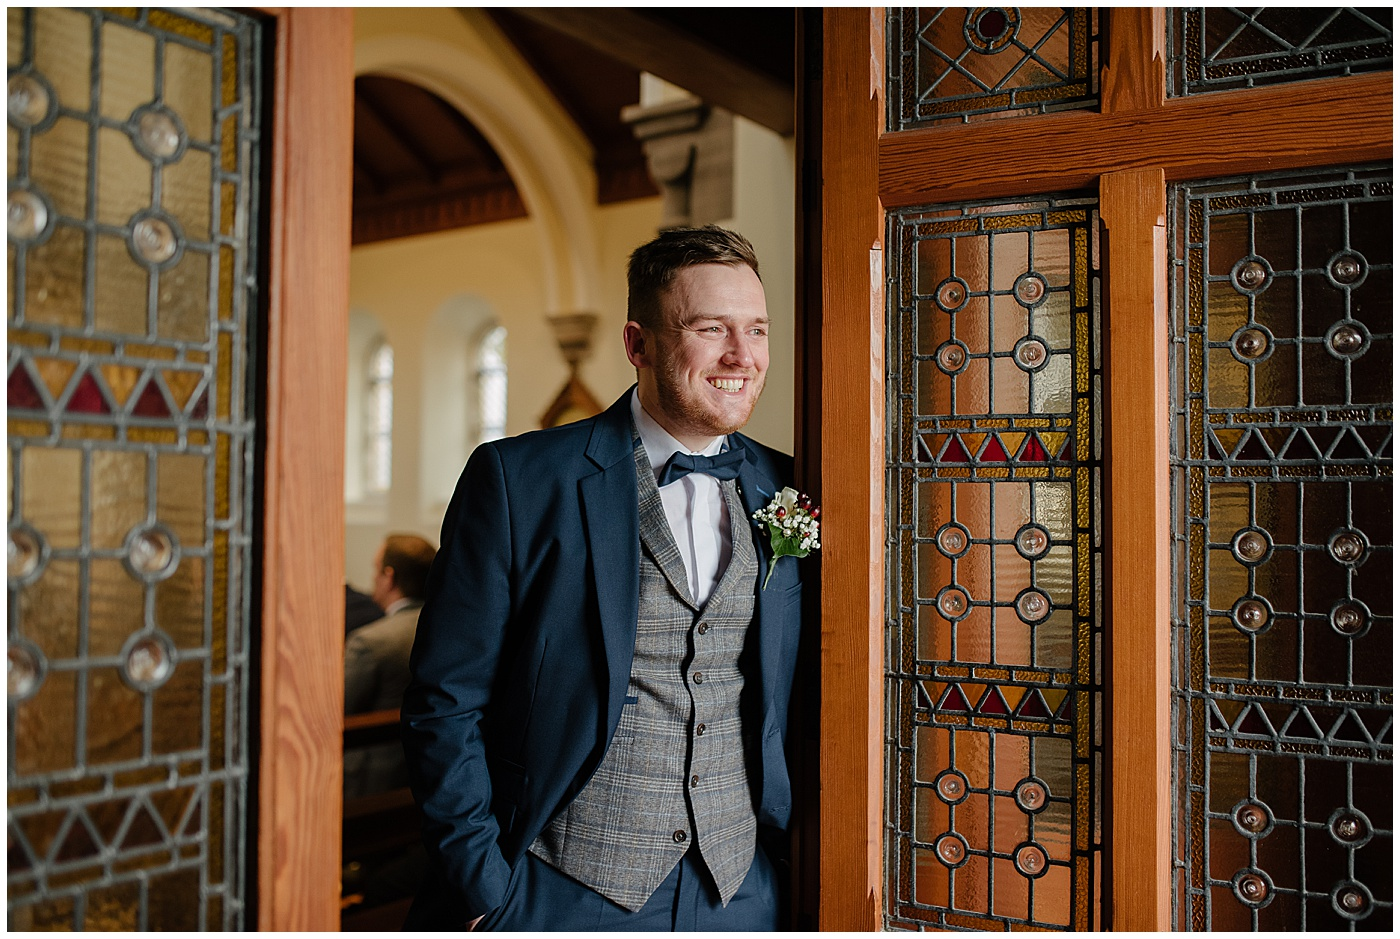 lissan-house-wedding-jude-browne-photography_0026.jpg